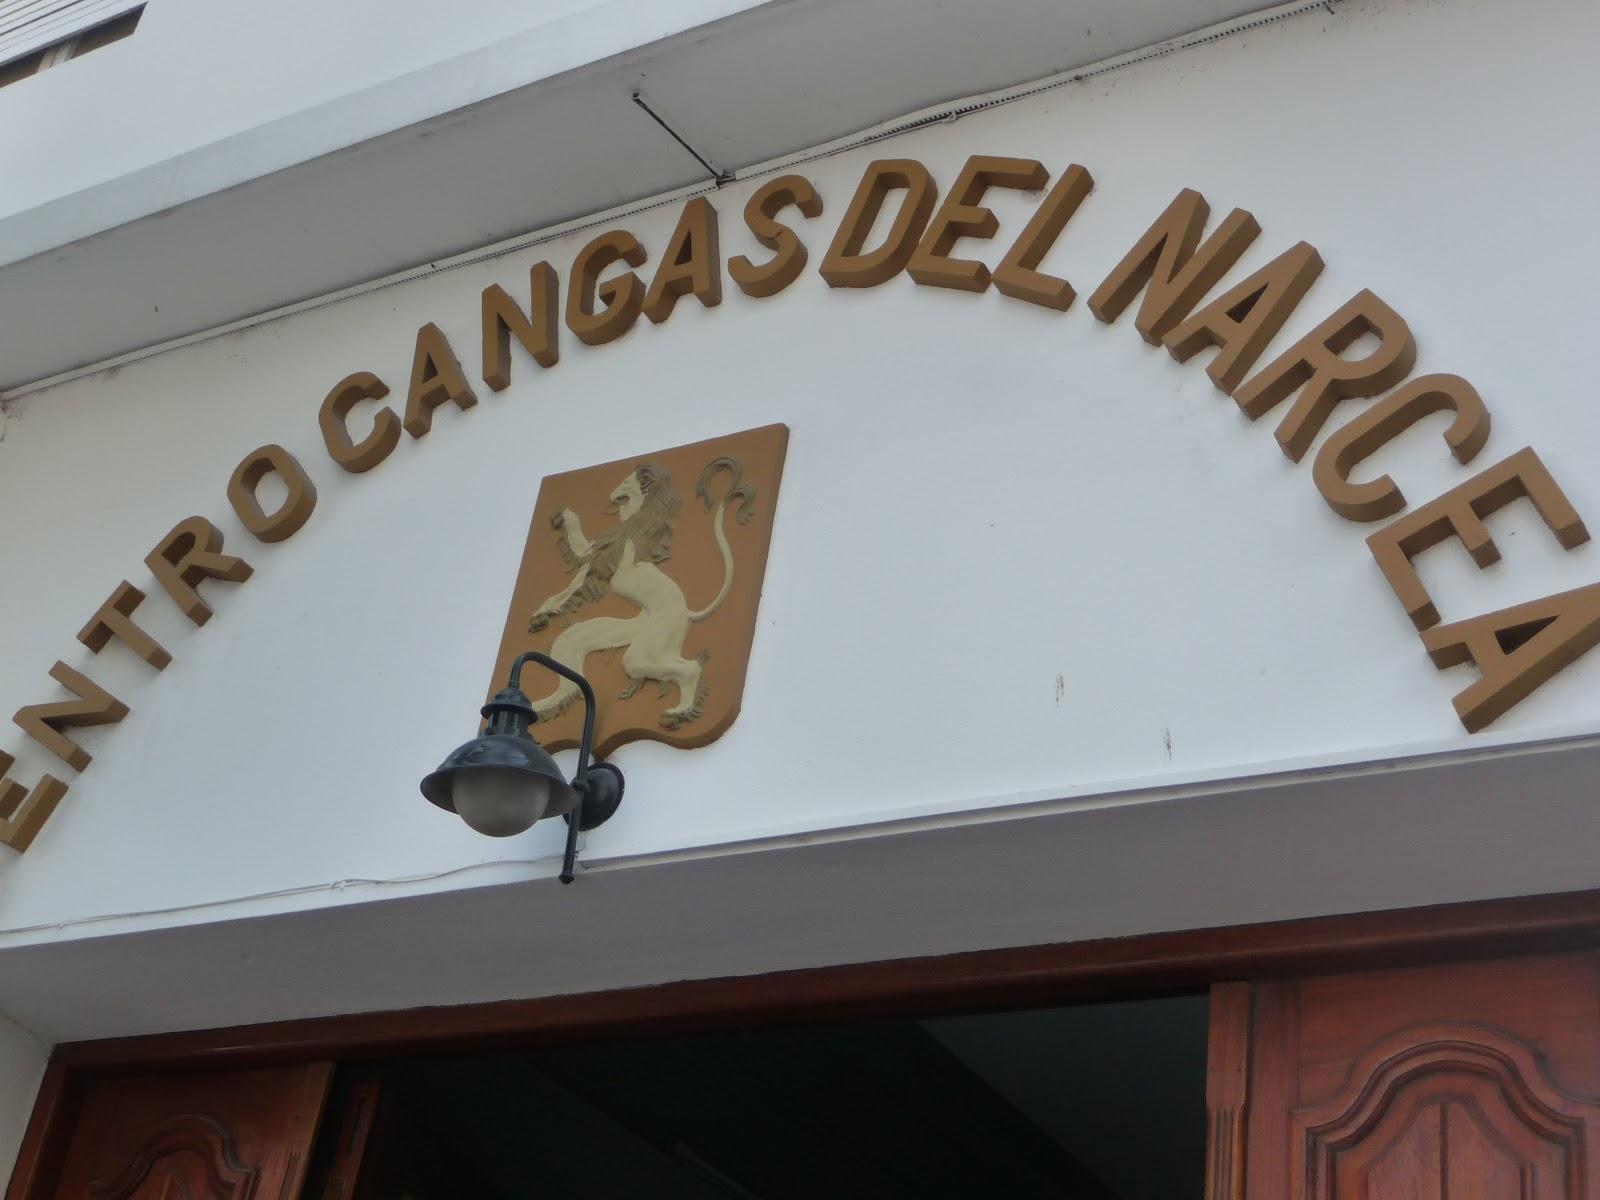 CANGAS DEL NARCEA- El Carmen en Buenos Aires